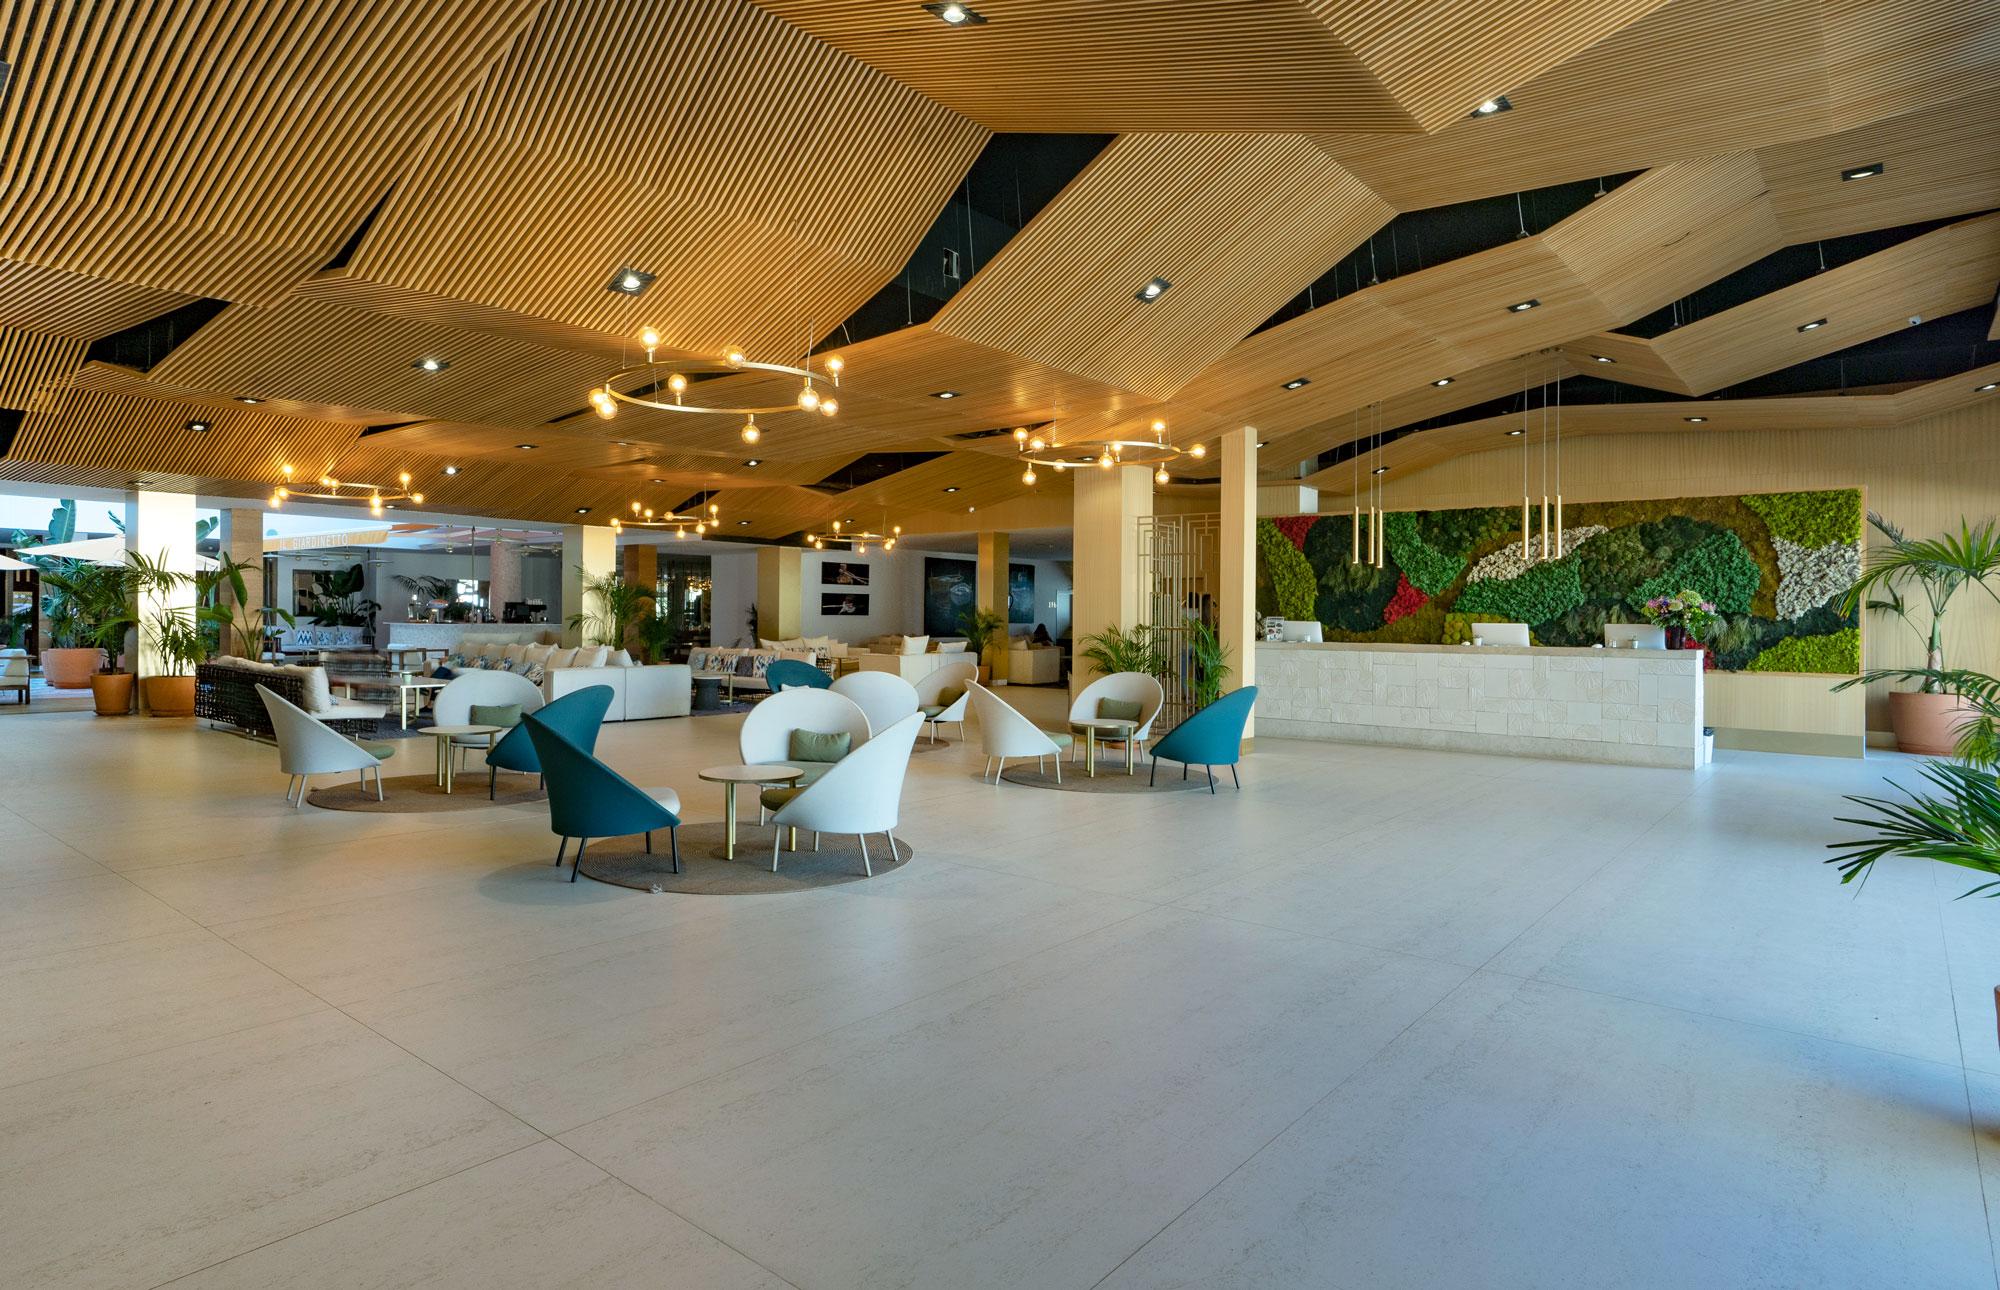 Hotel Mediterráneo  - Hotel Mediterraneo Park 1 Dekton Silestone Piedra Natural Cosentino 47